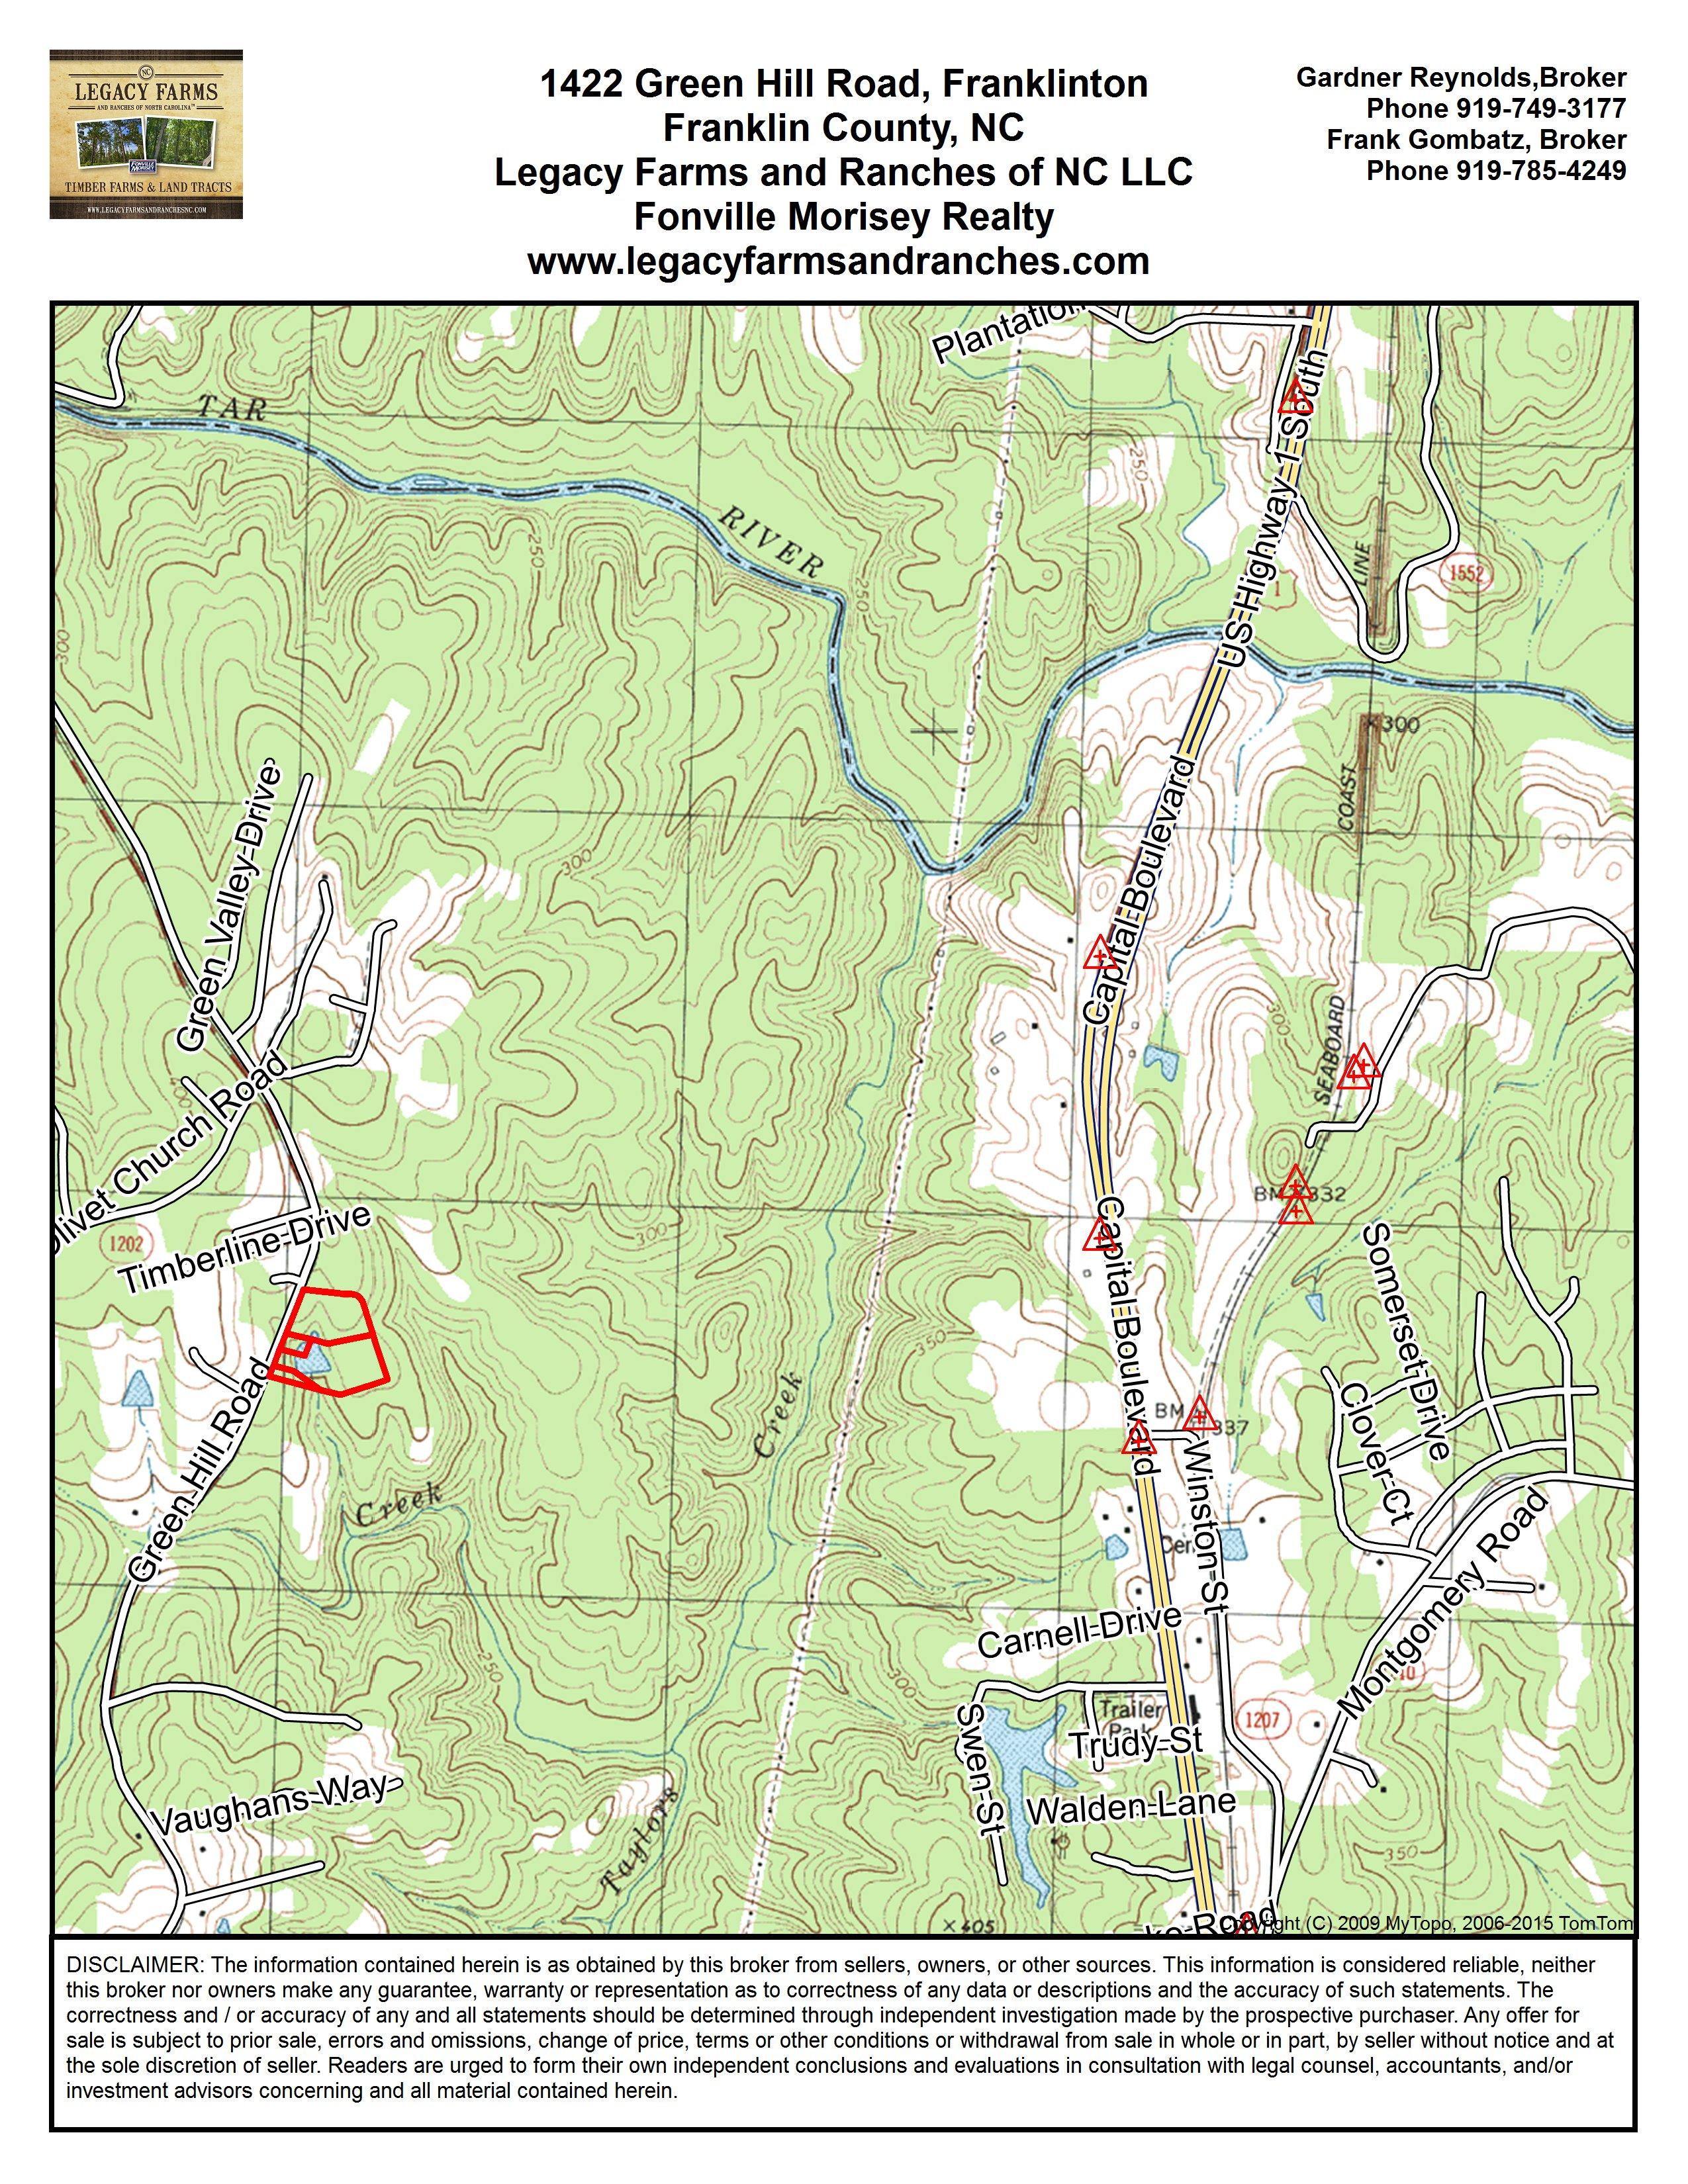 Mls 2030541on Green Hill Road Farm In Franklinton